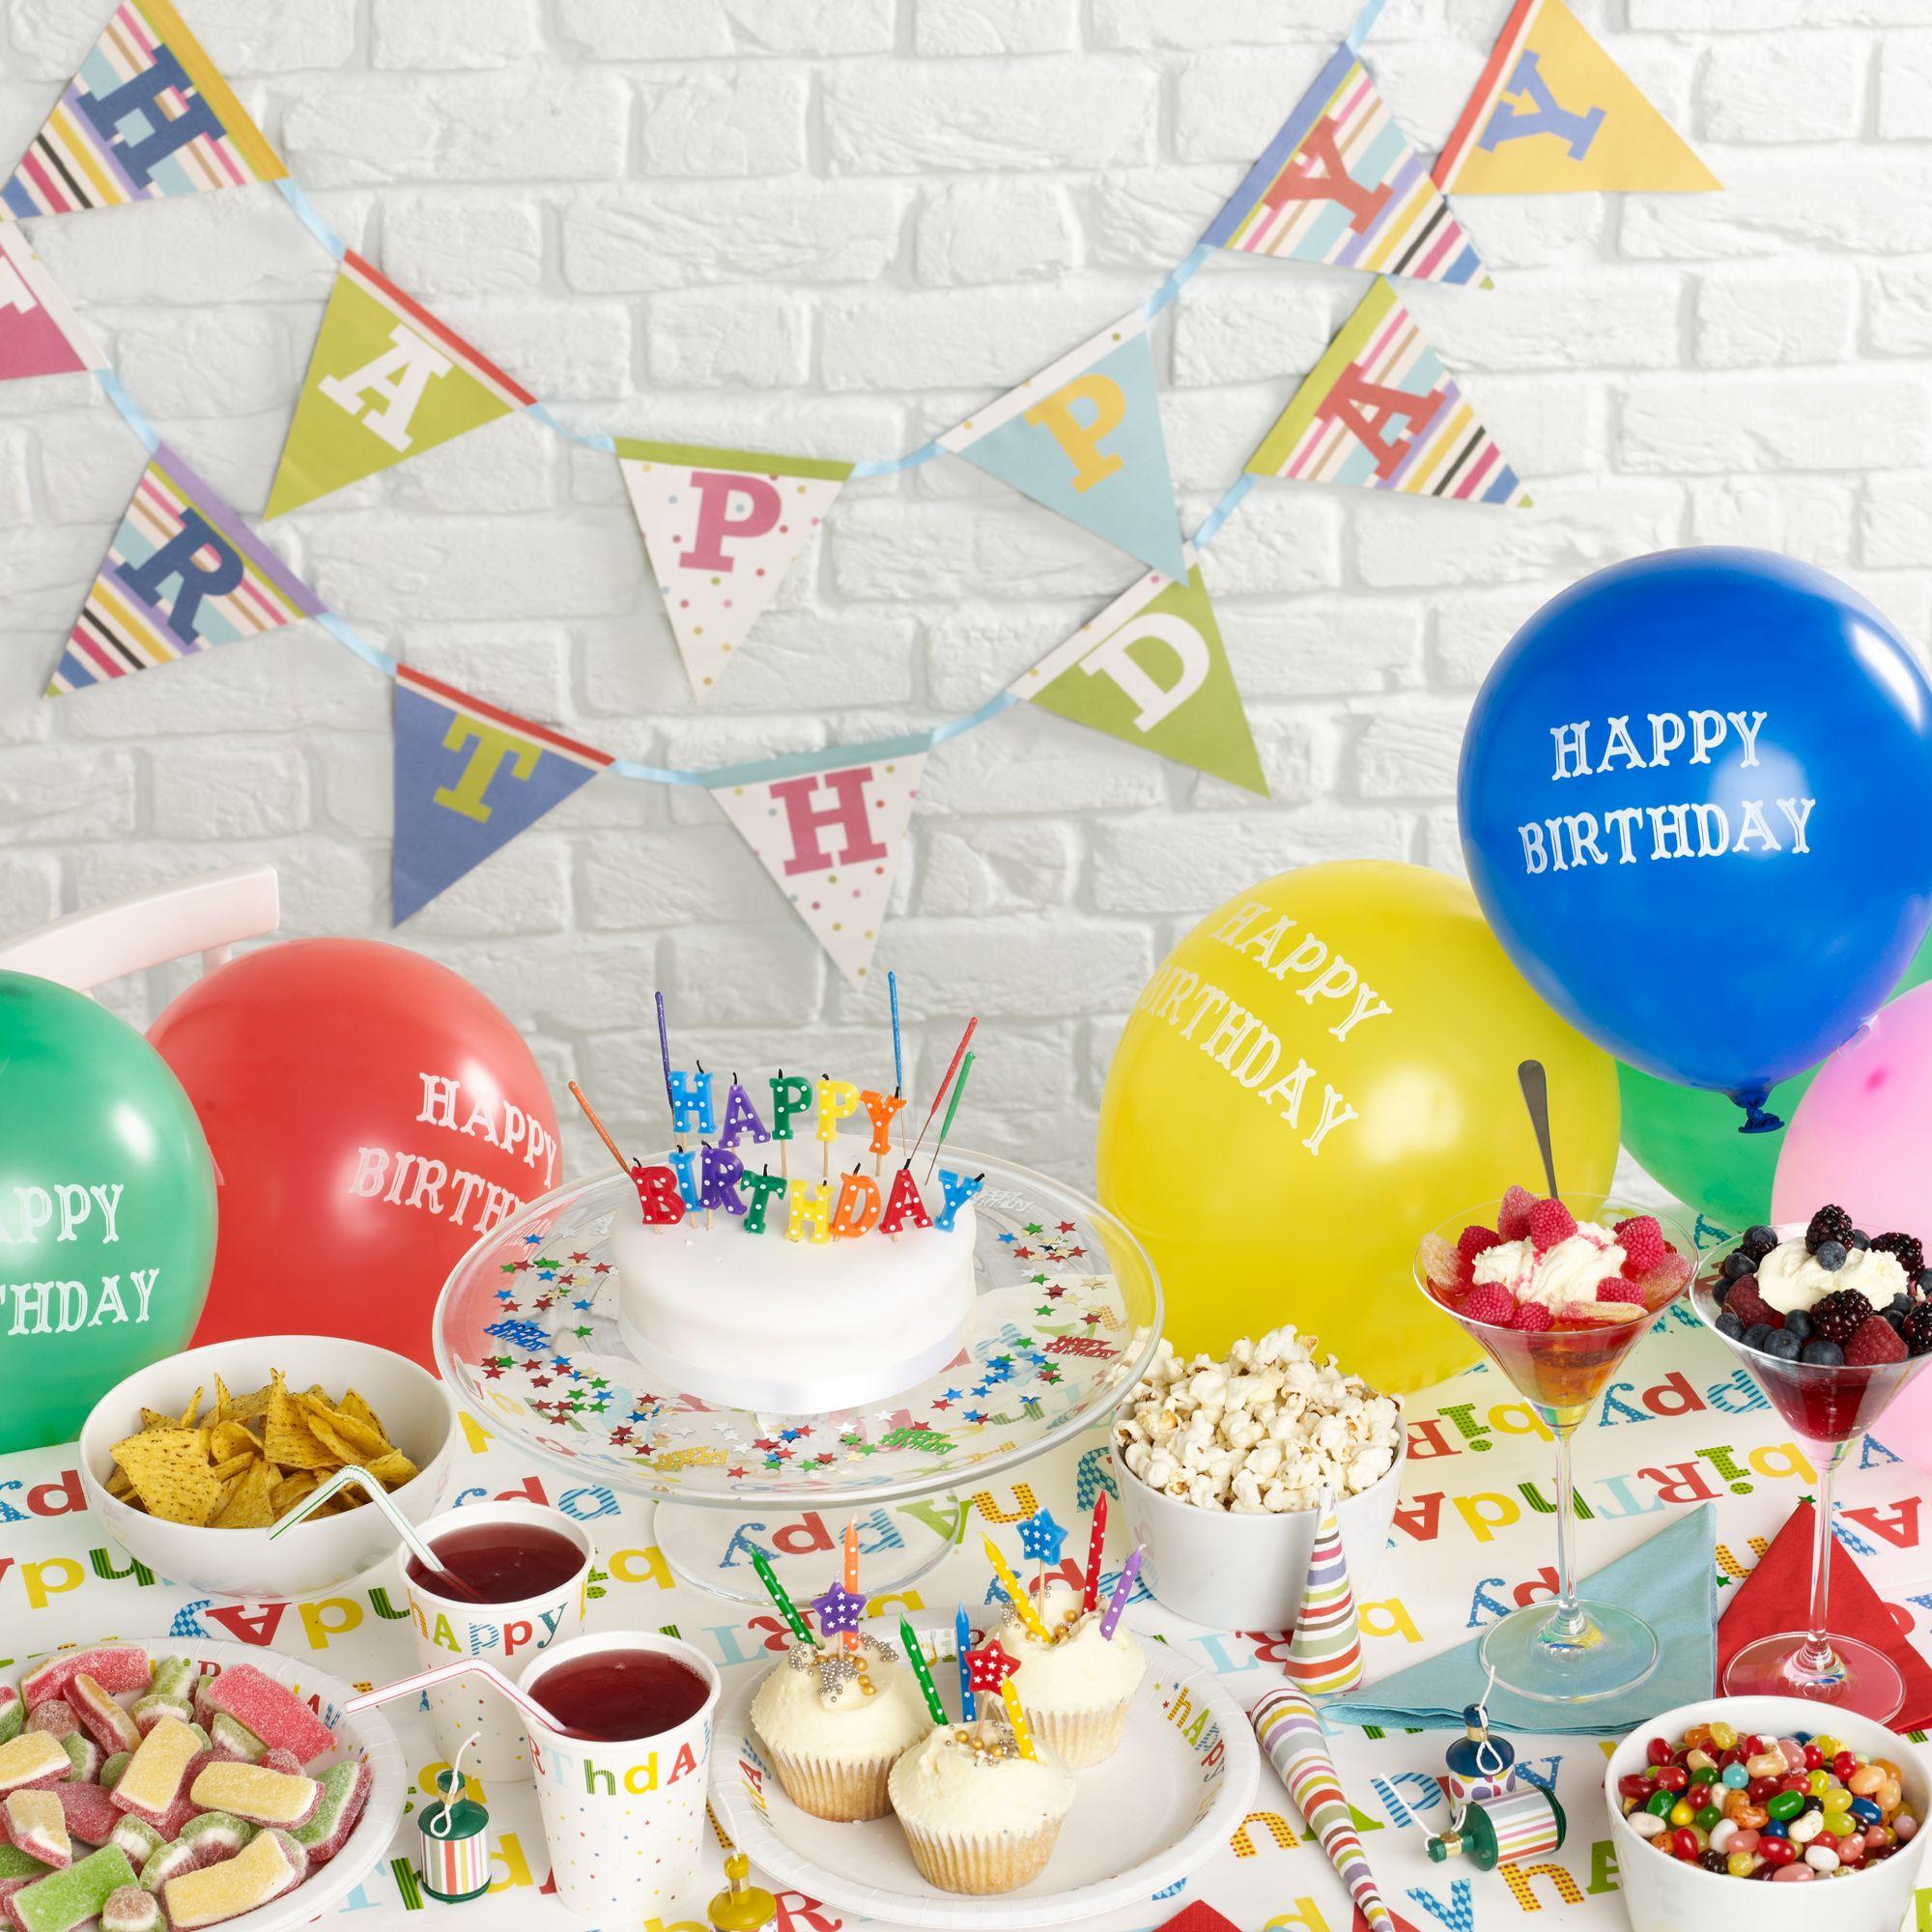 Birthday Cake John Lewis : John Lewis Birthday Party Decorations ~ Image Inspiration ...